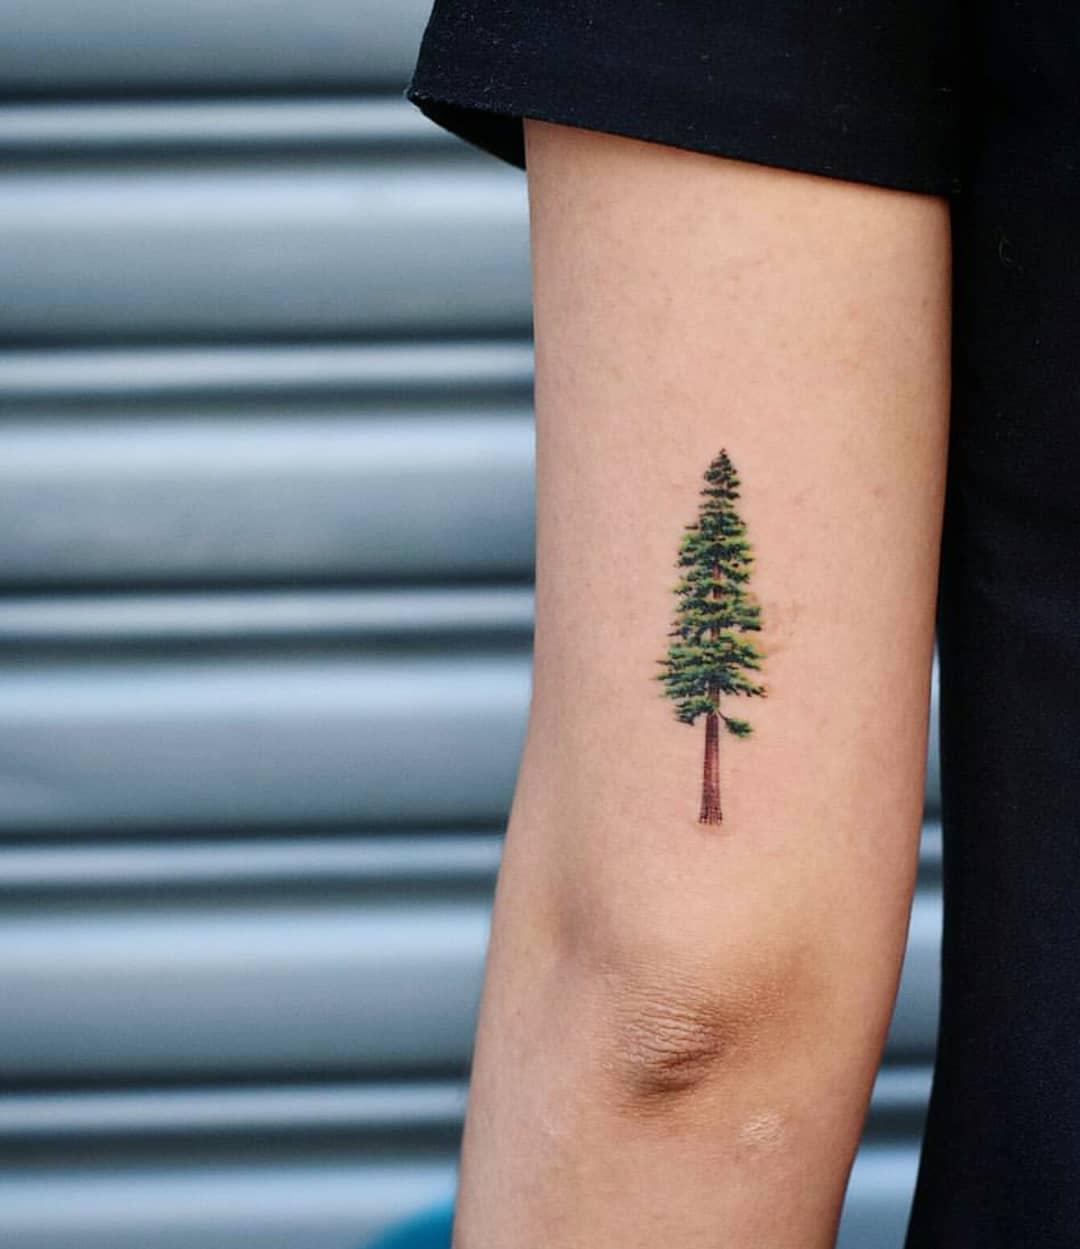 Pine tree tattoo by Dragon Ink